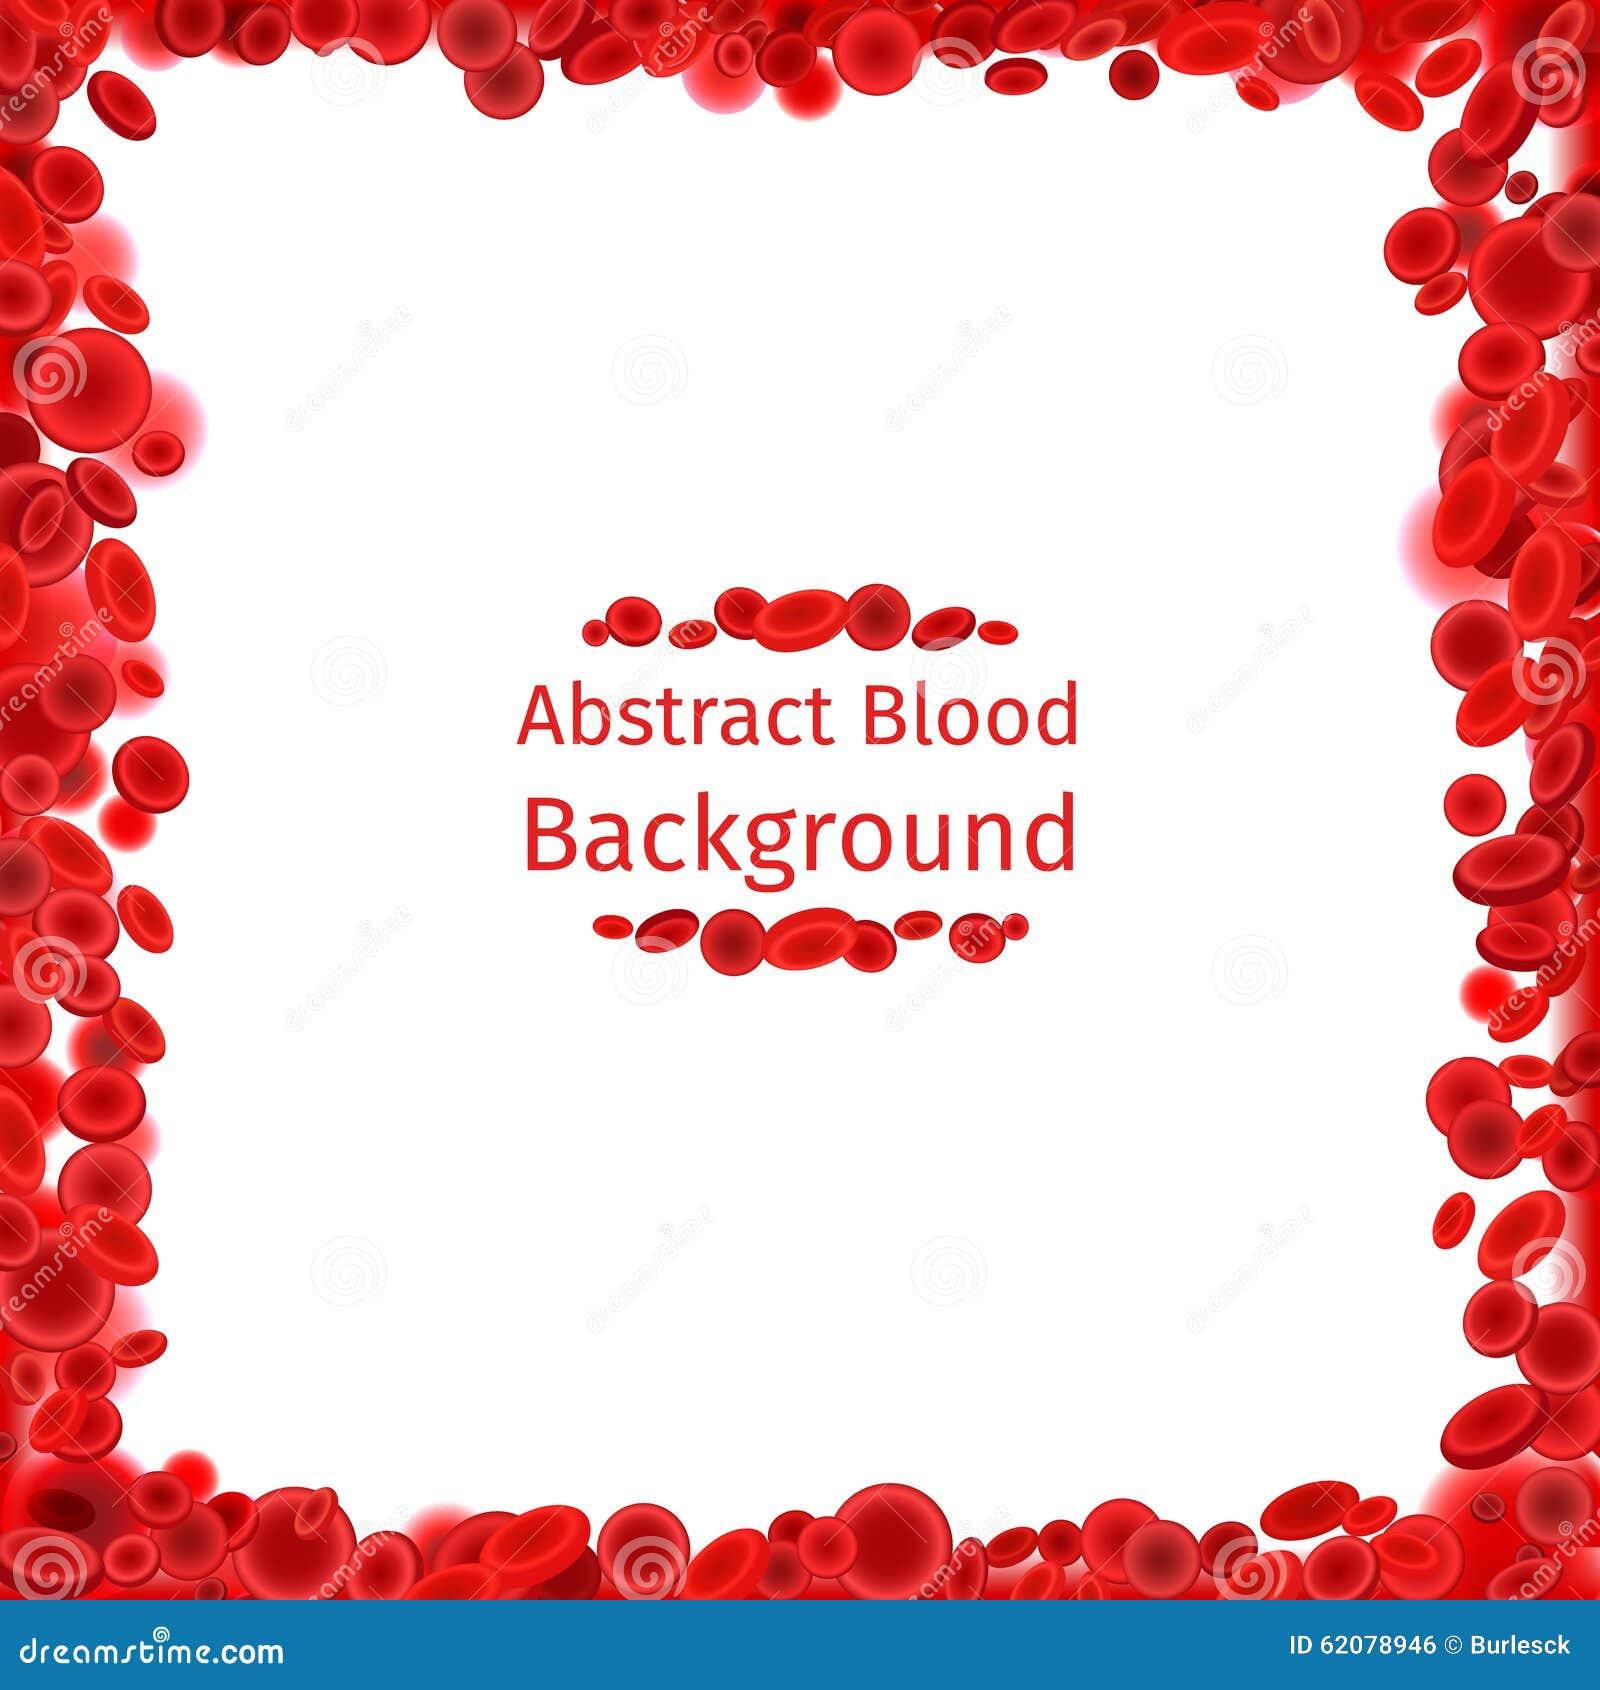 Blood Cells Frame For Medical Poster Stock Vector - Illustration of ...